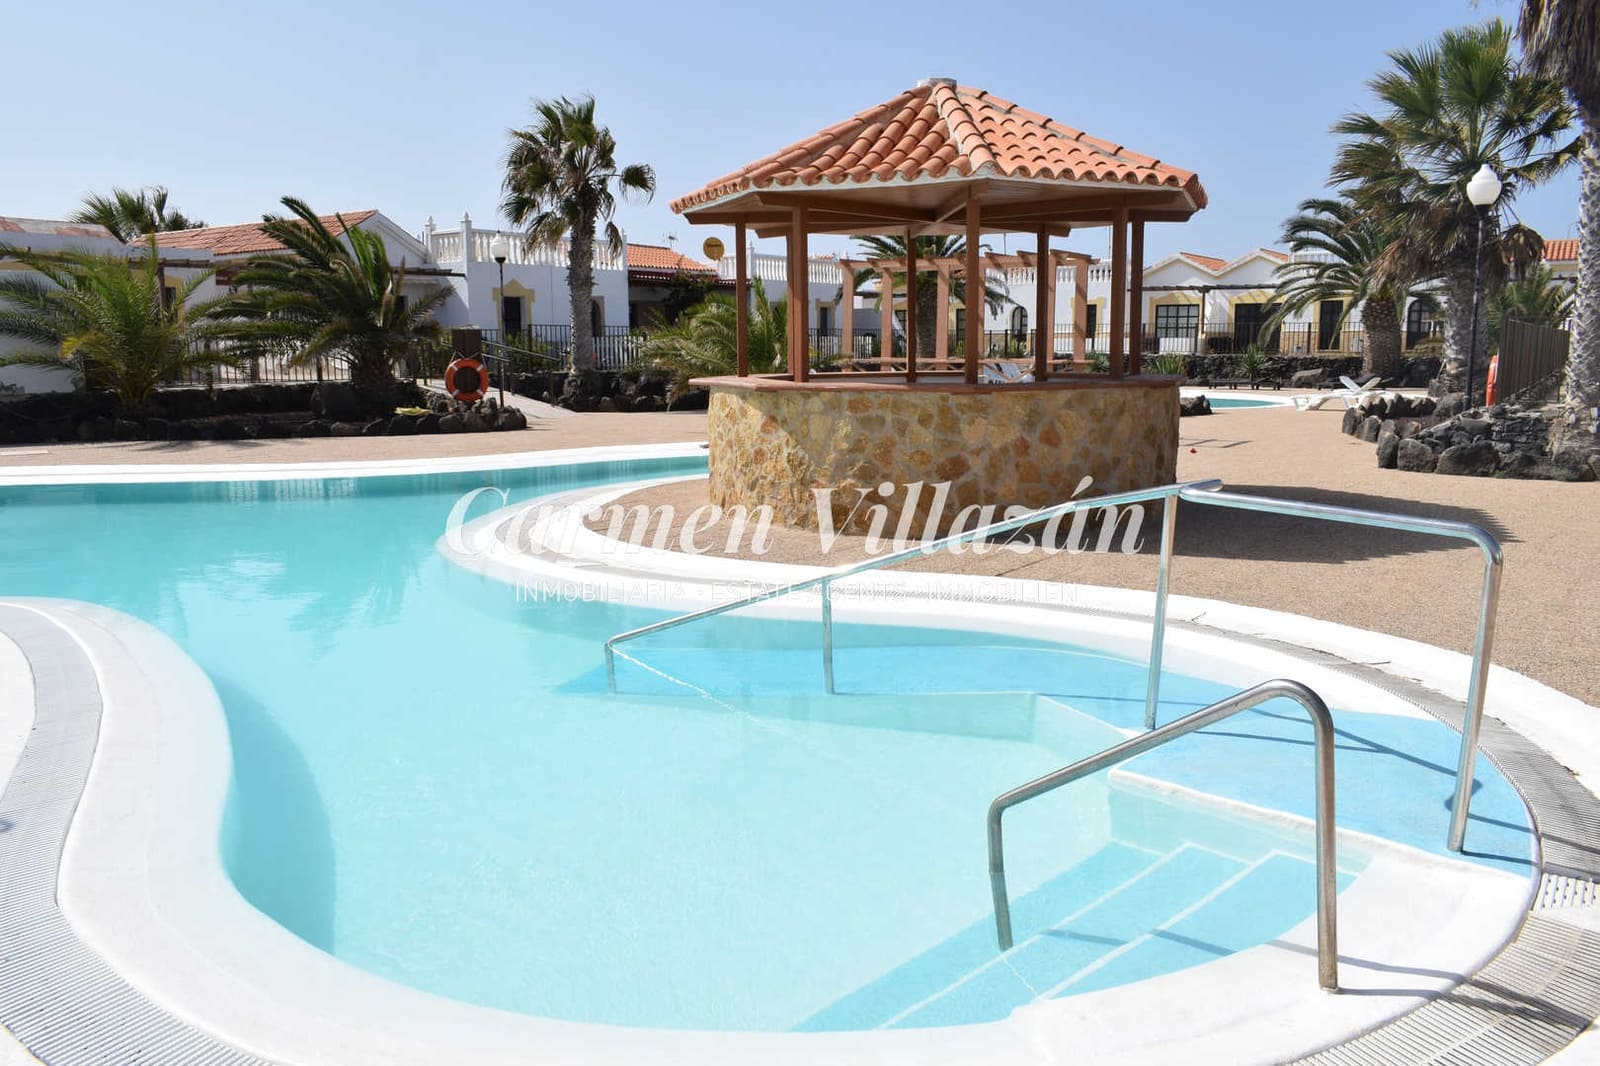 1 sovrum Bungalow till salu i Costa de Antigua med pool - 80 000 € (Ref: 5332014)